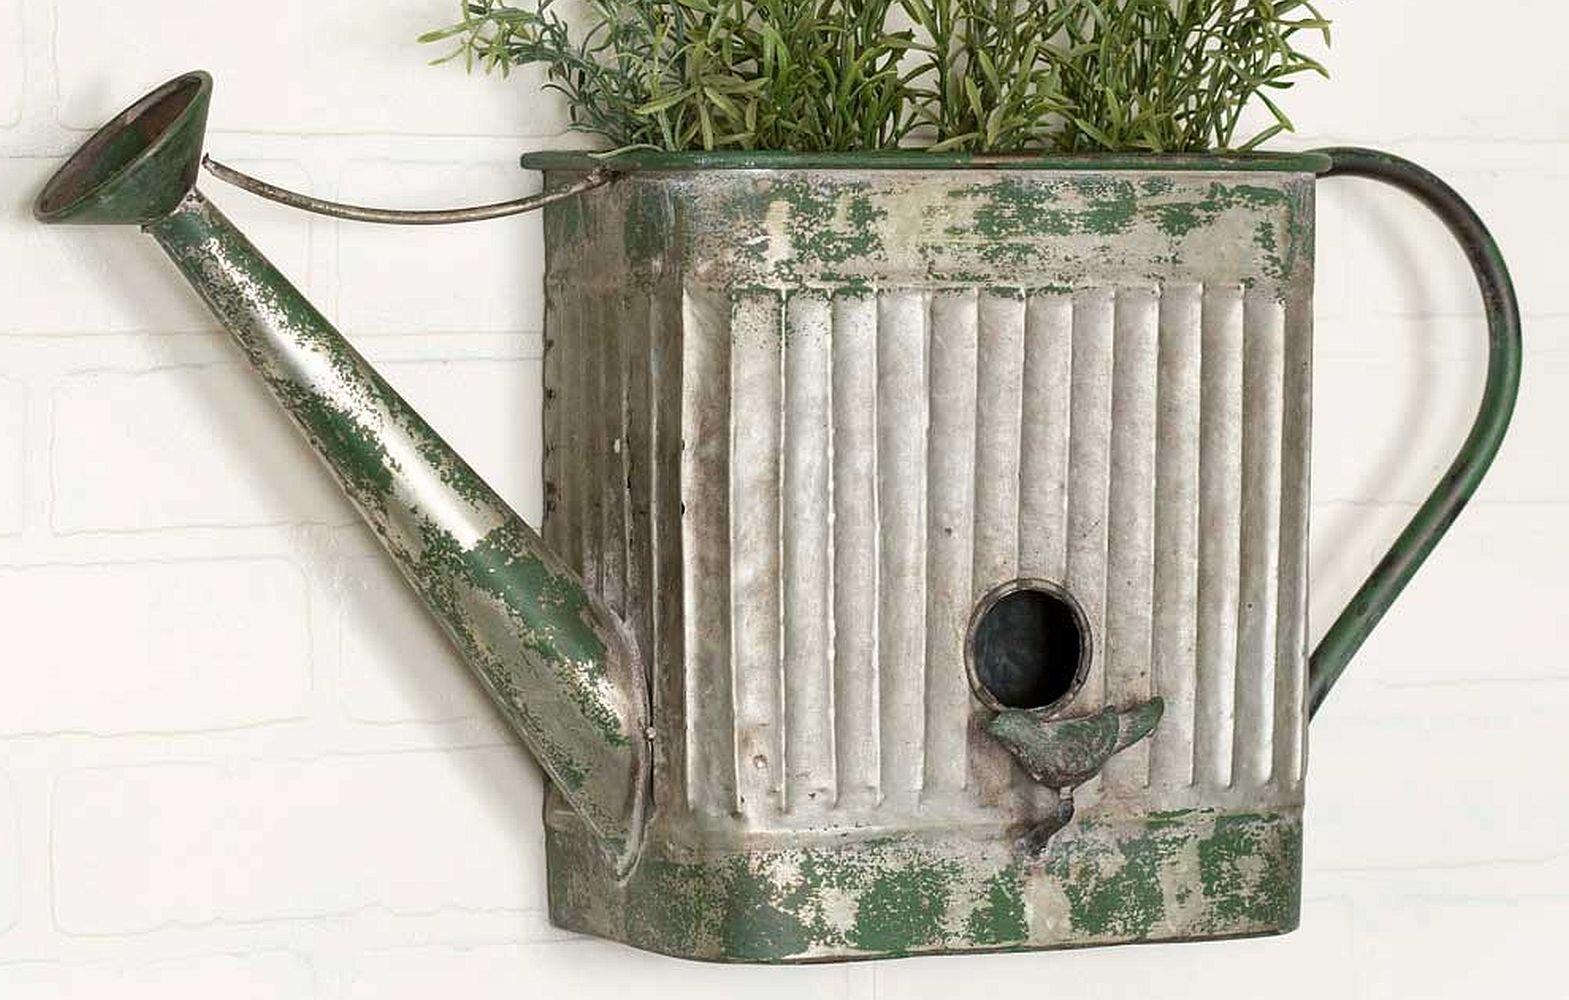 Rustic Watering Can Planter abd Birdhouse, grey